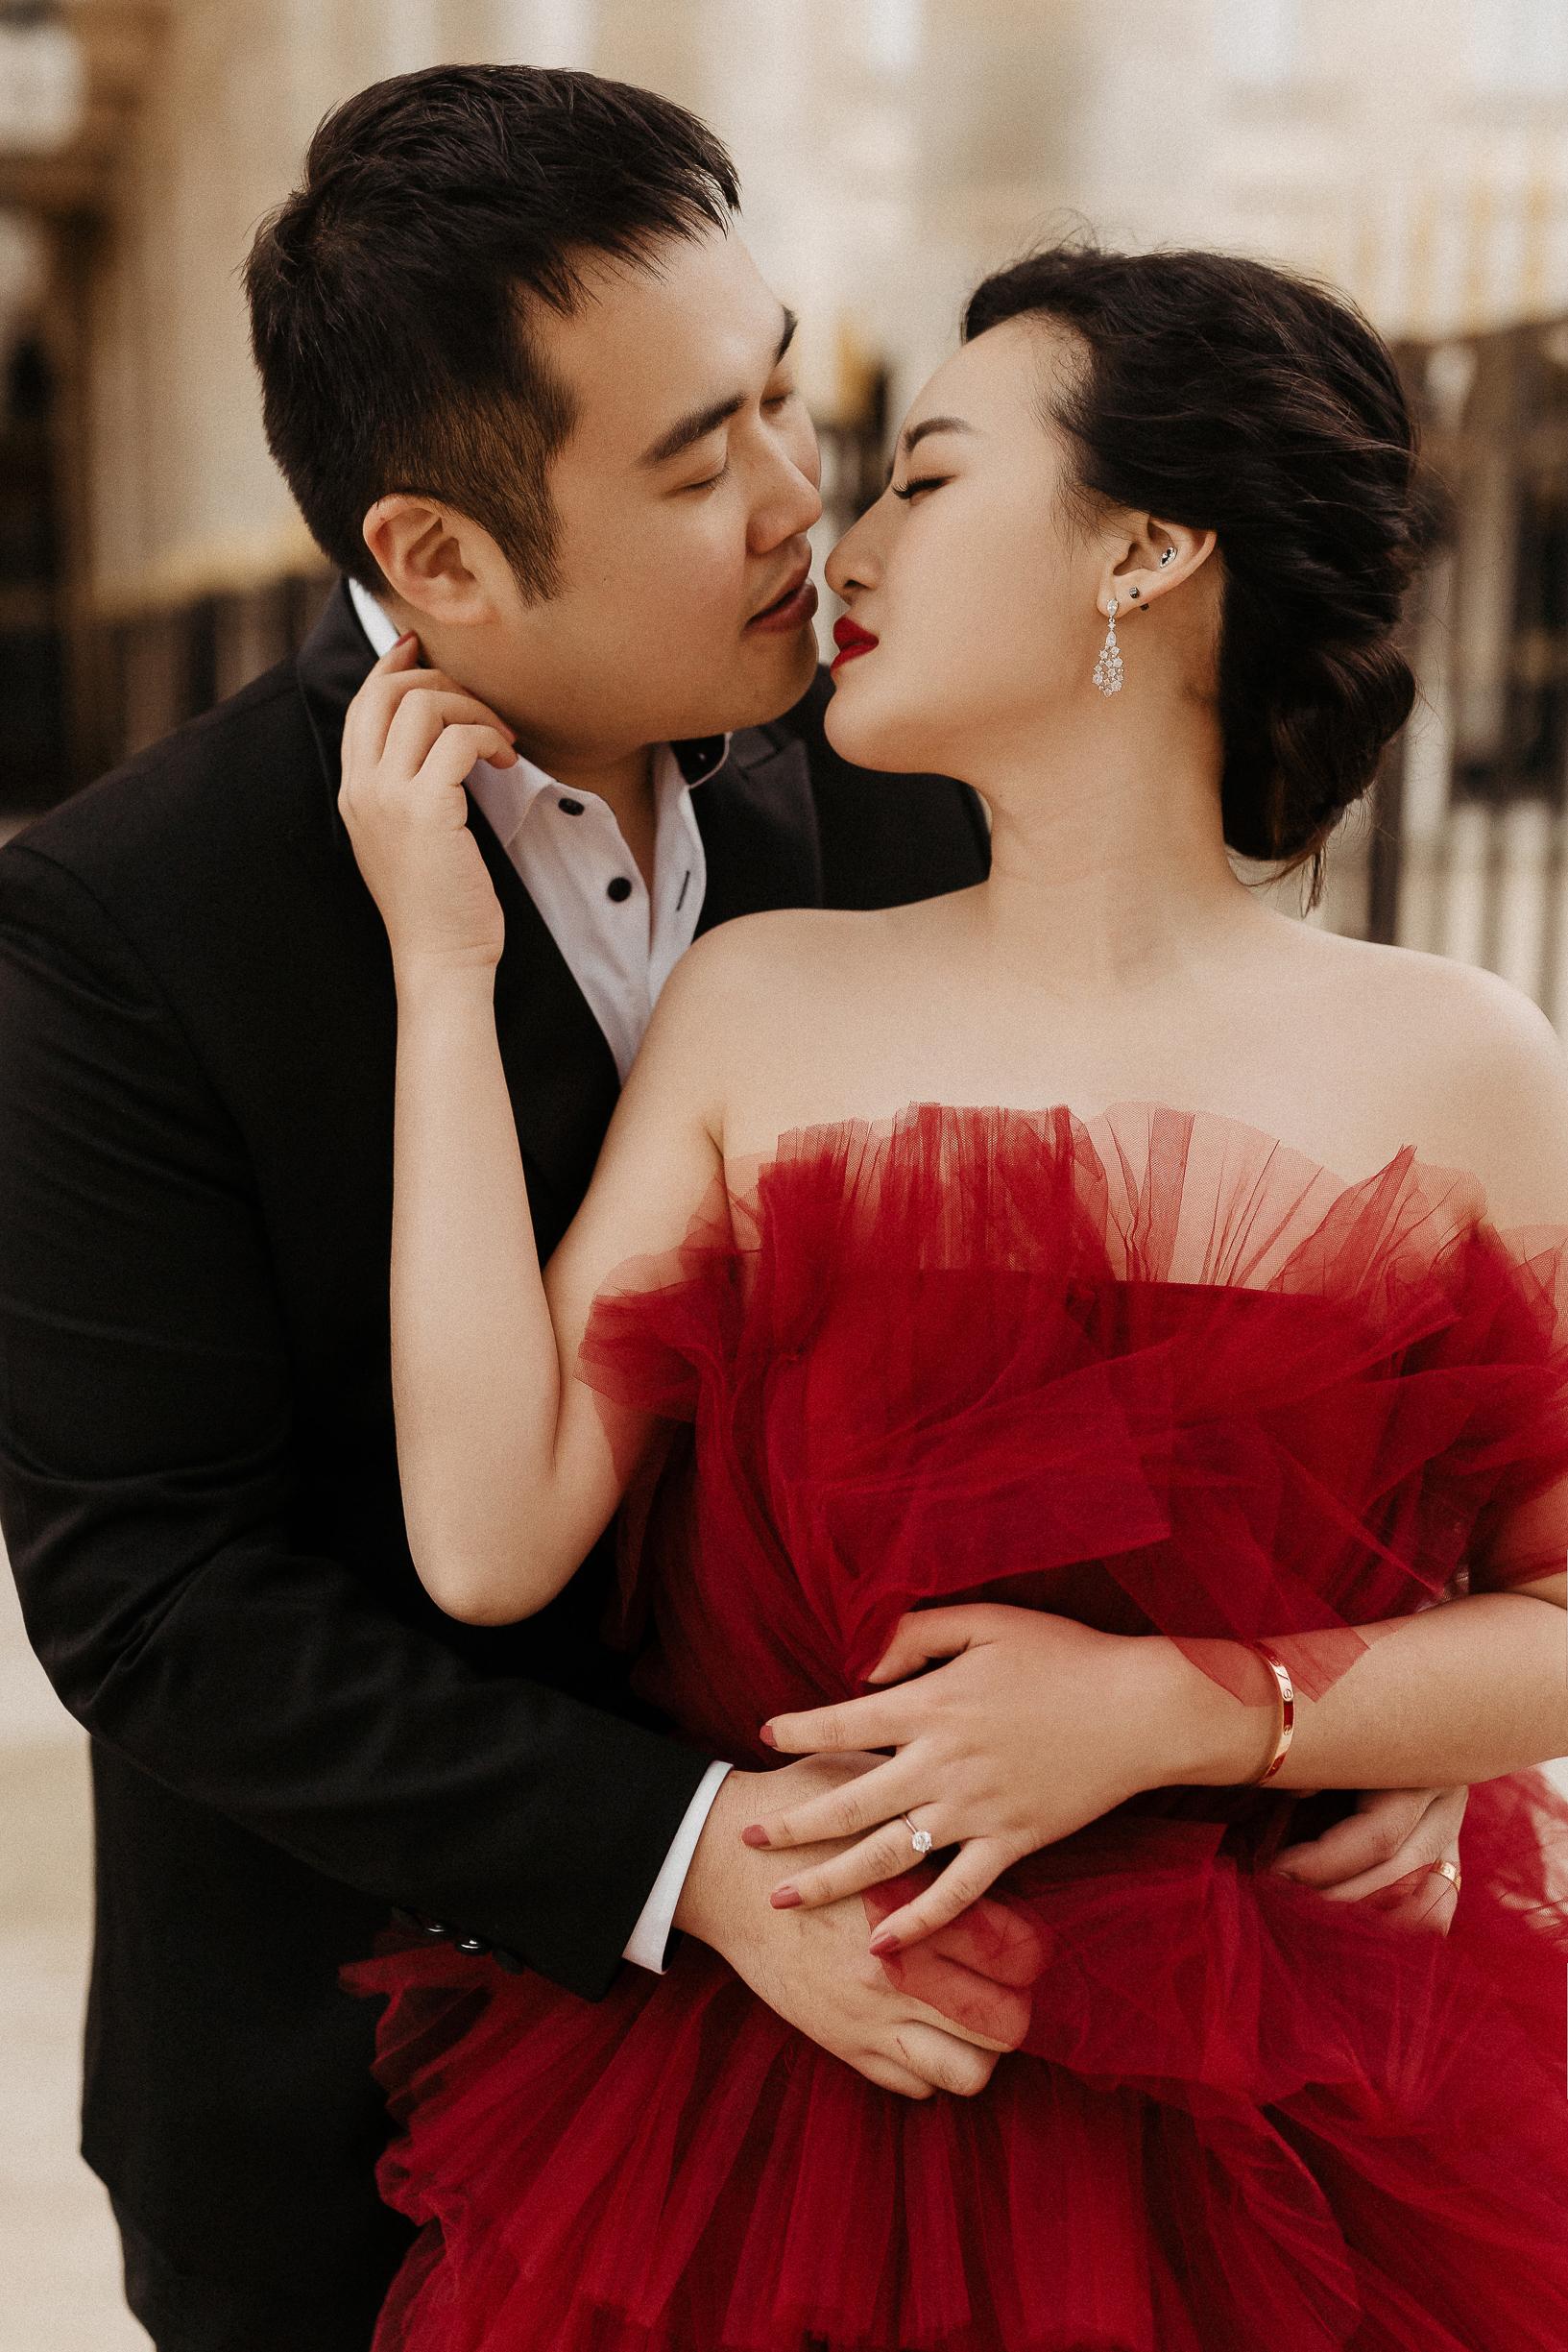 A Paris pre-wedding & elopement in one day